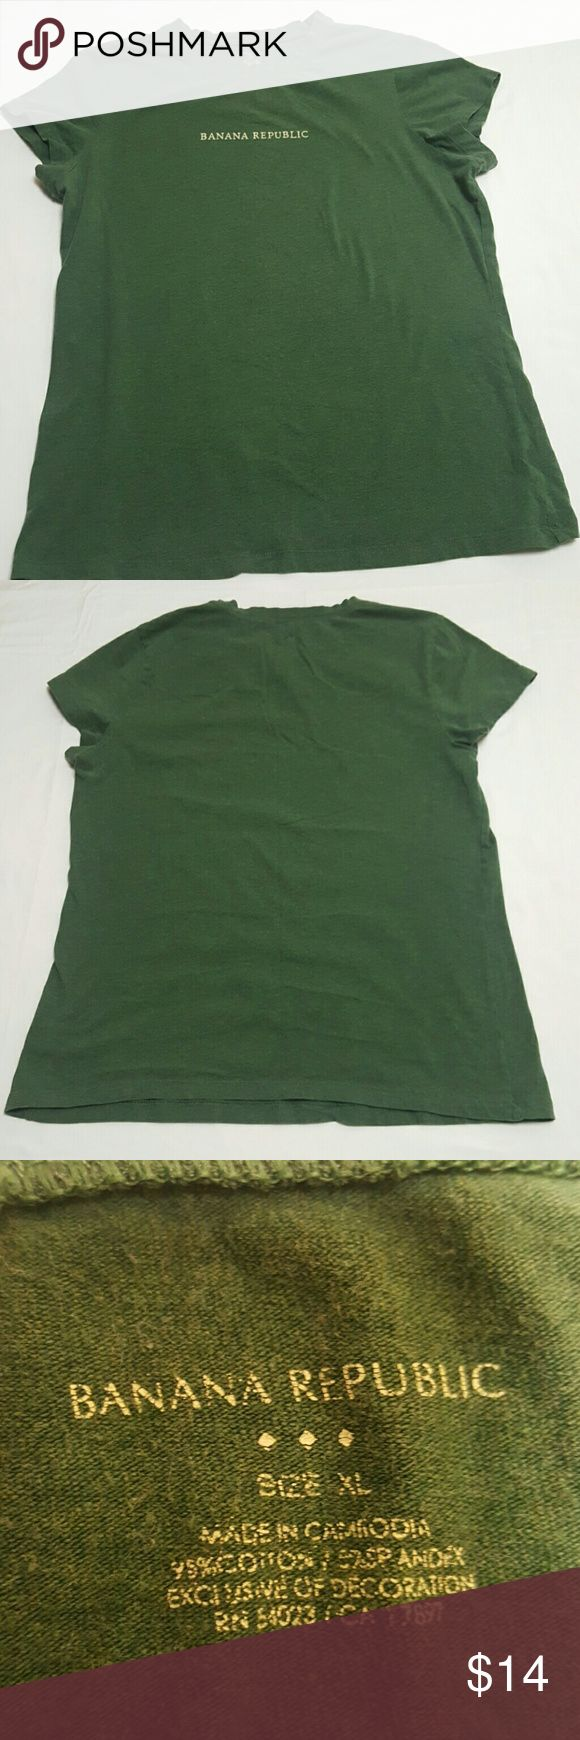 Banana Republic XL t-shirt Dk green lightly heathered t-shirt, in slightly used condition. Banana Republic Tops Tees - Short Sleeve